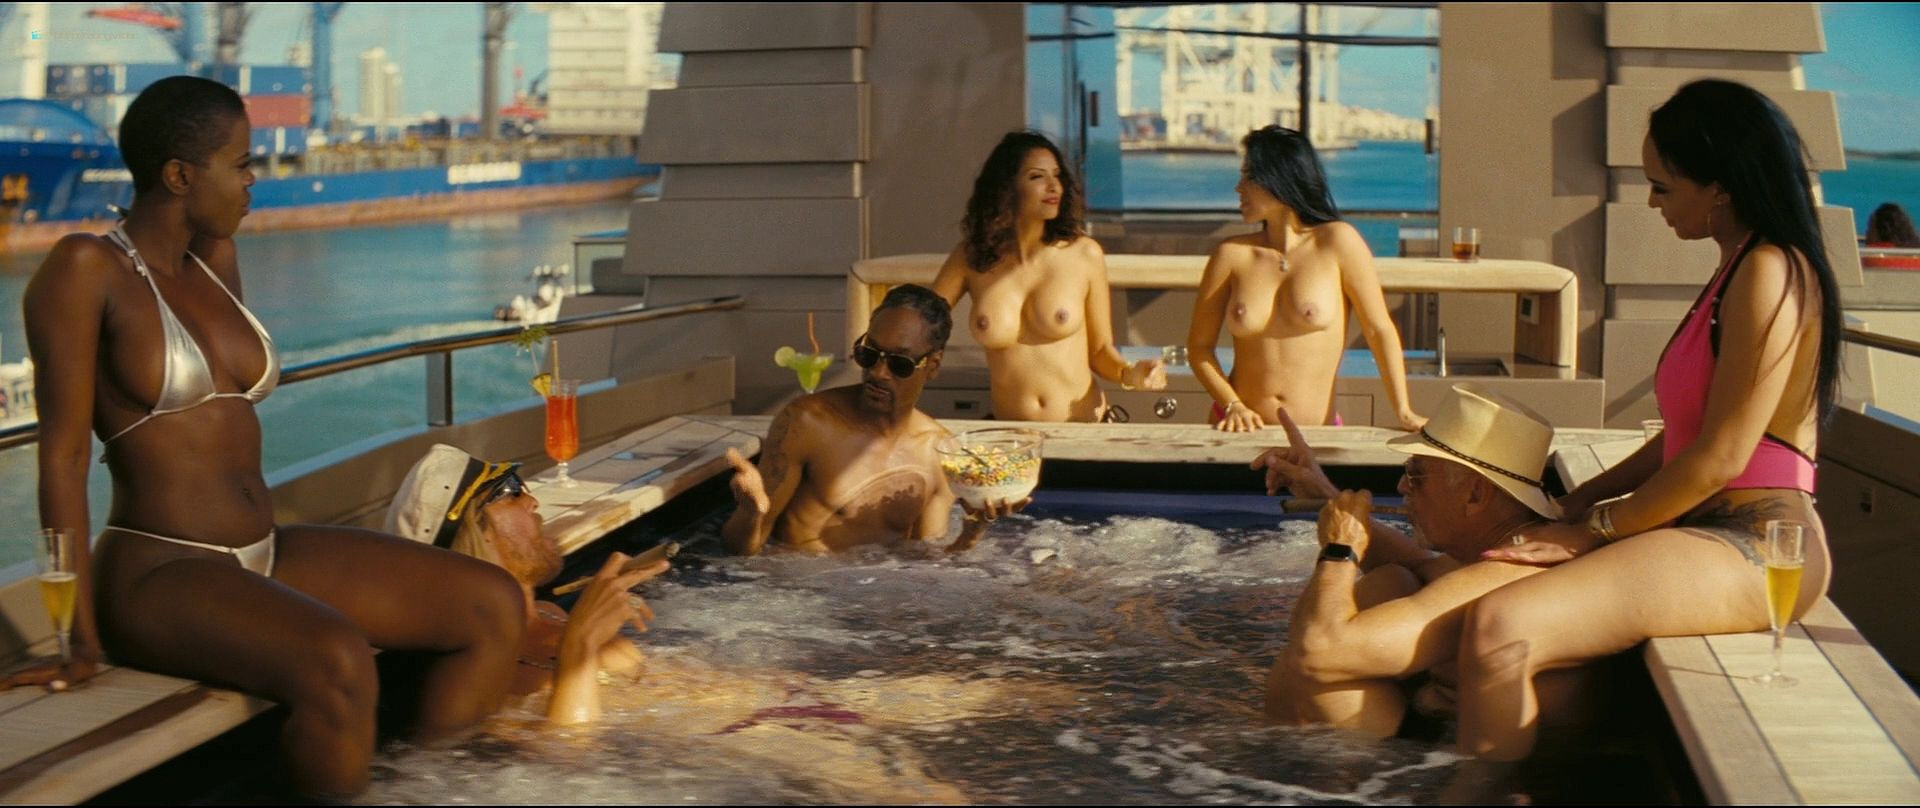 Fisher nude isla Isla Fisher